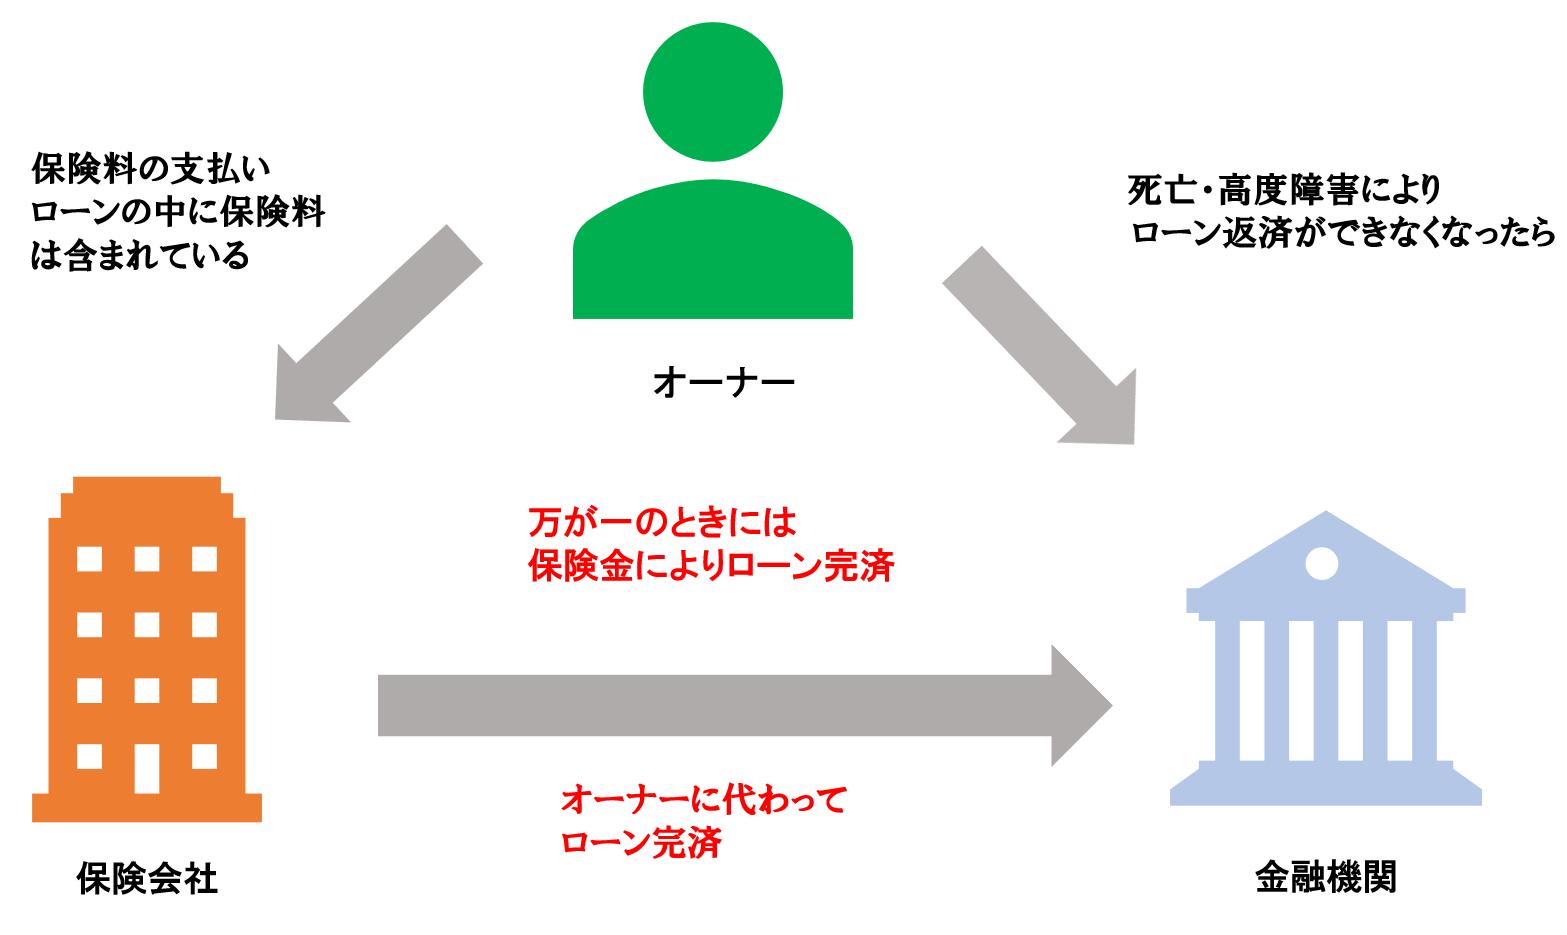 団体信用生命保険・仕組み